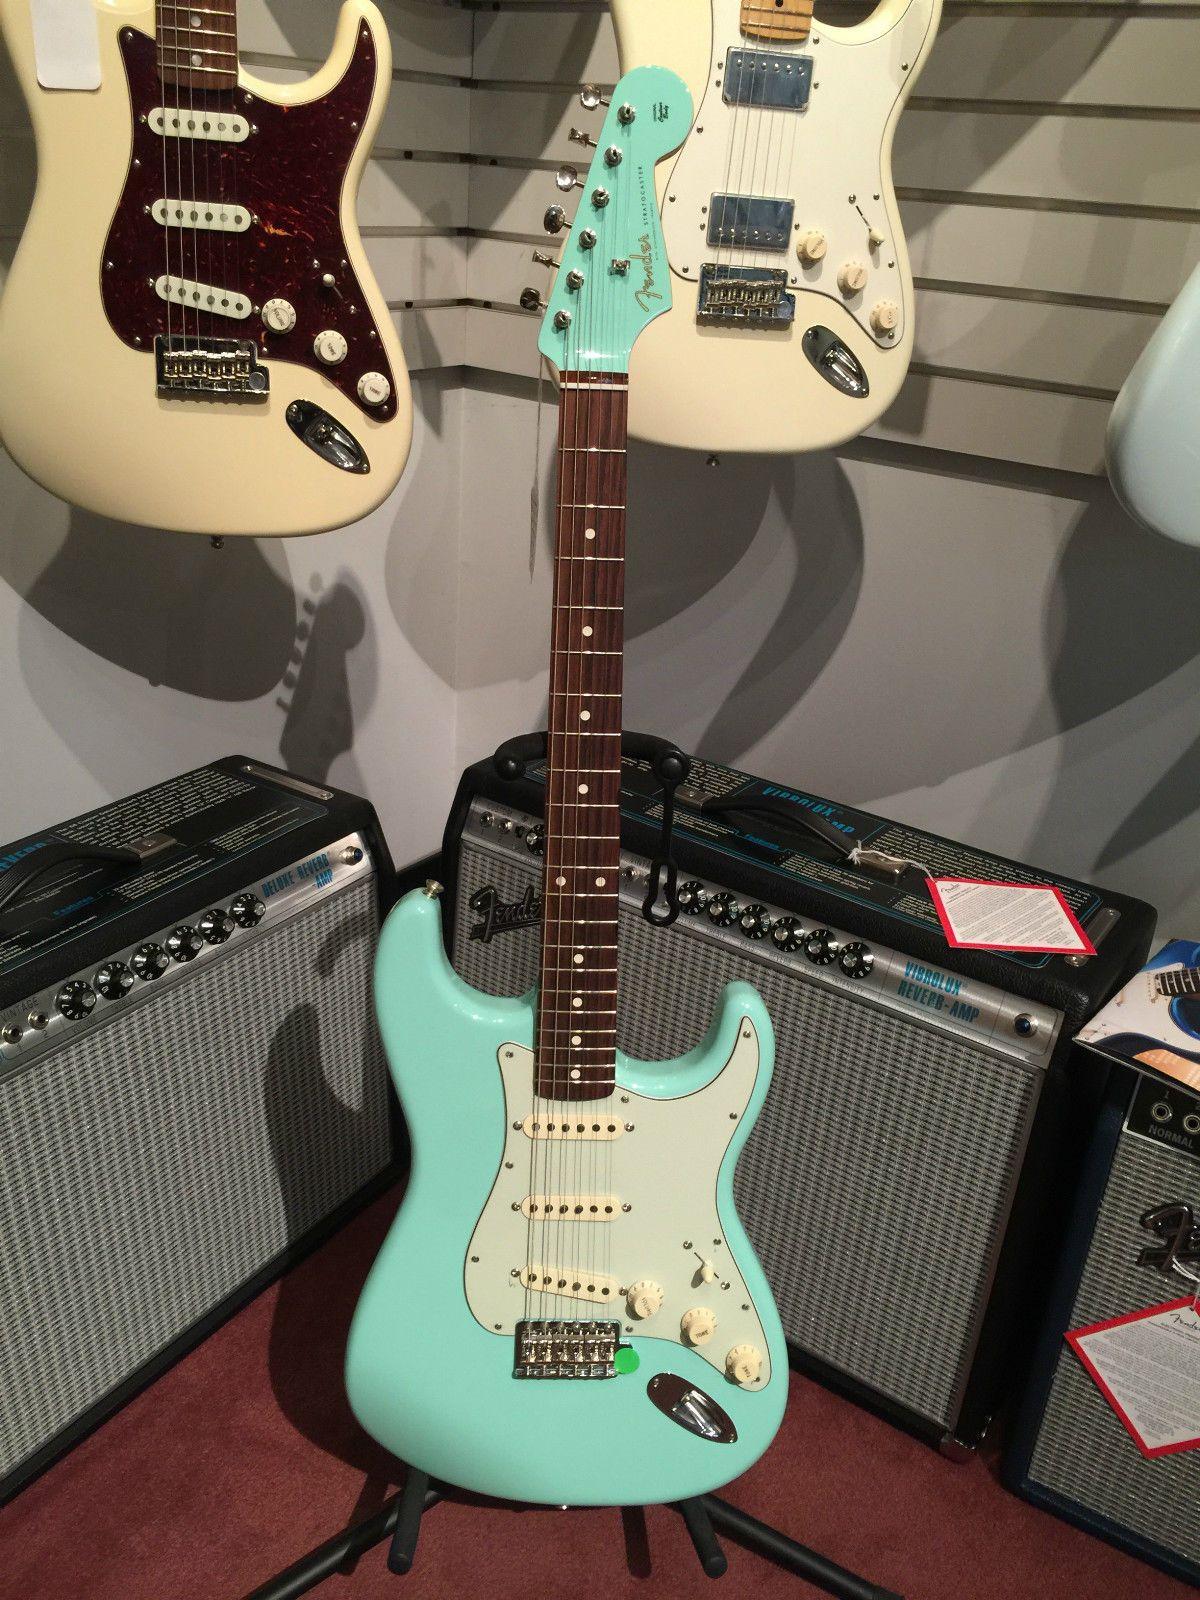 details about fender stratocaster special edition guitar 2019 seafoam green mist guitars. Black Bedroom Furniture Sets. Home Design Ideas